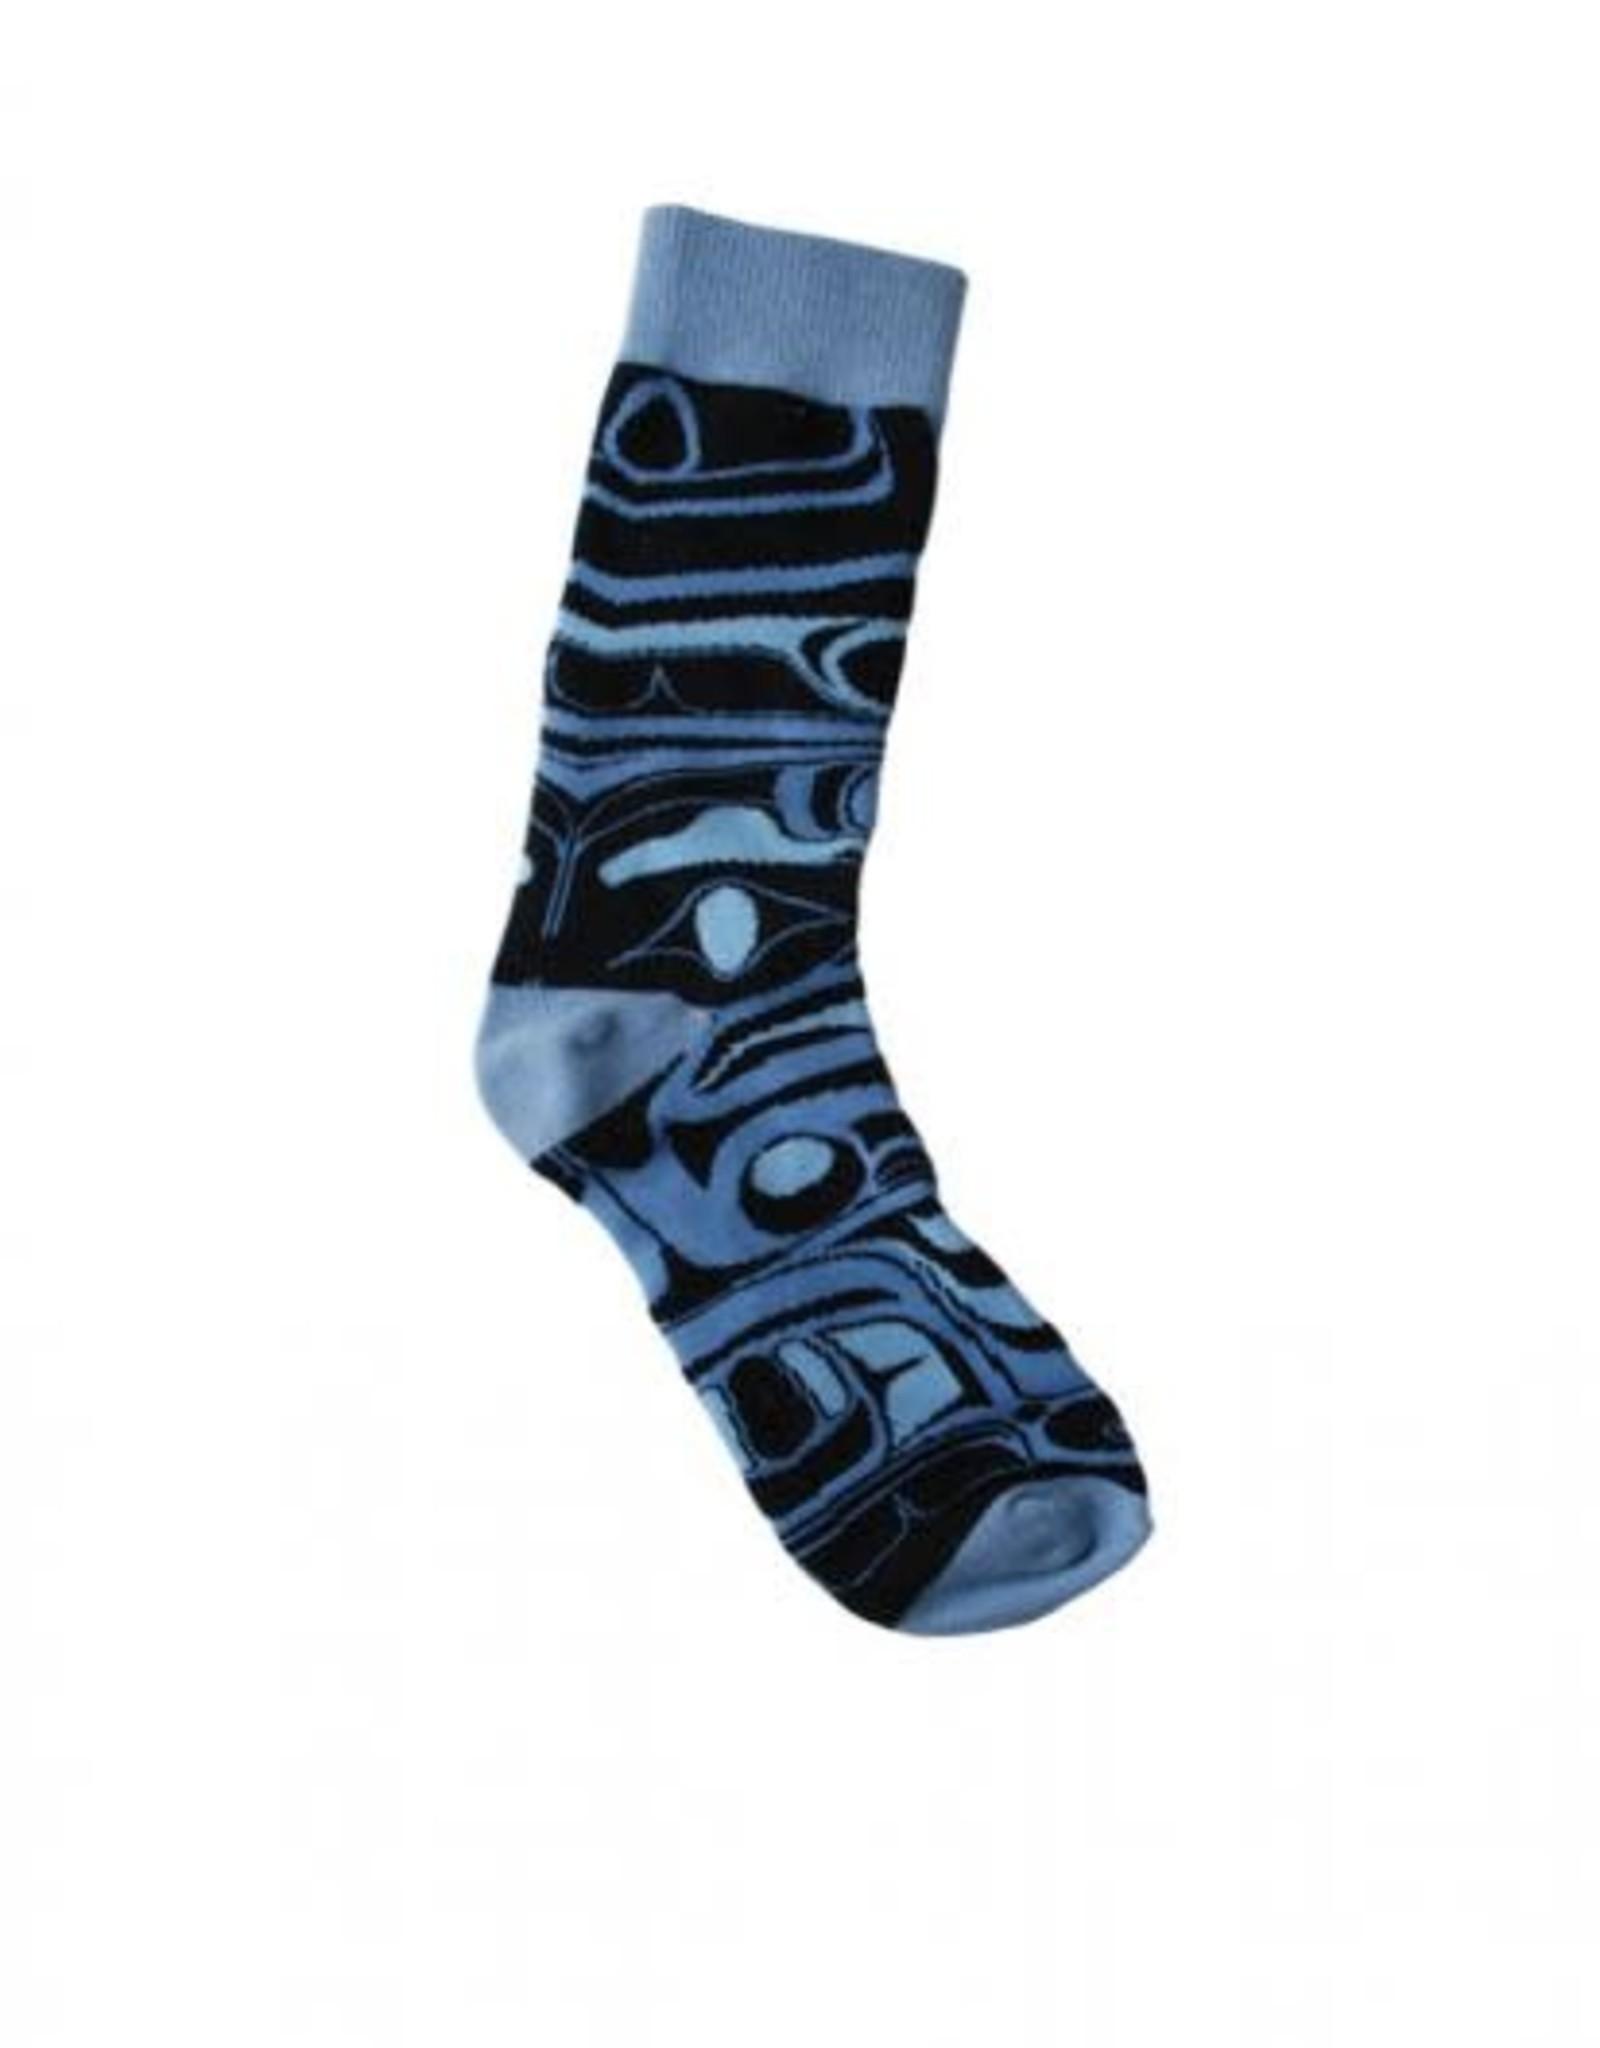 Frog Box Socks- design by Bill Helin